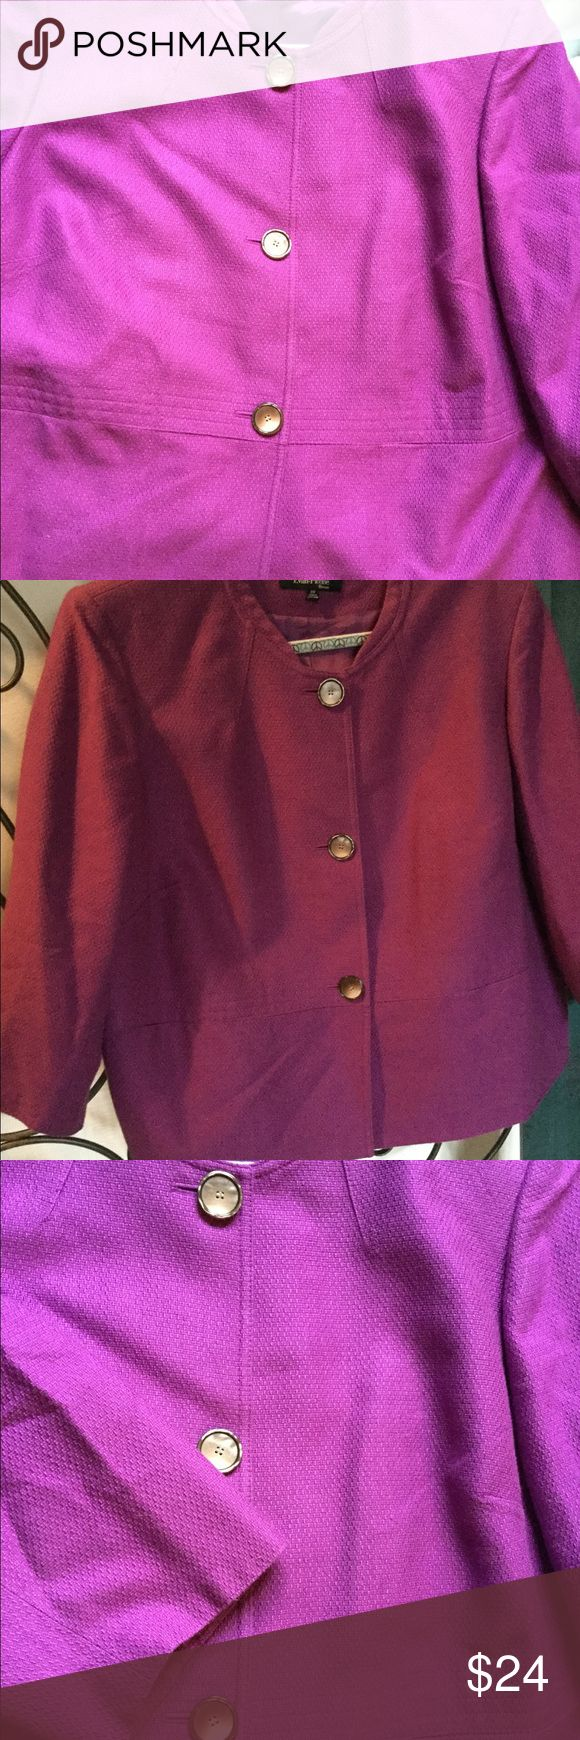 PURPLE BLAZER Purple blazer with 3/4 sleeves, trim at waist and tiny collar. Evan Picone Jackets & Coats Blazers